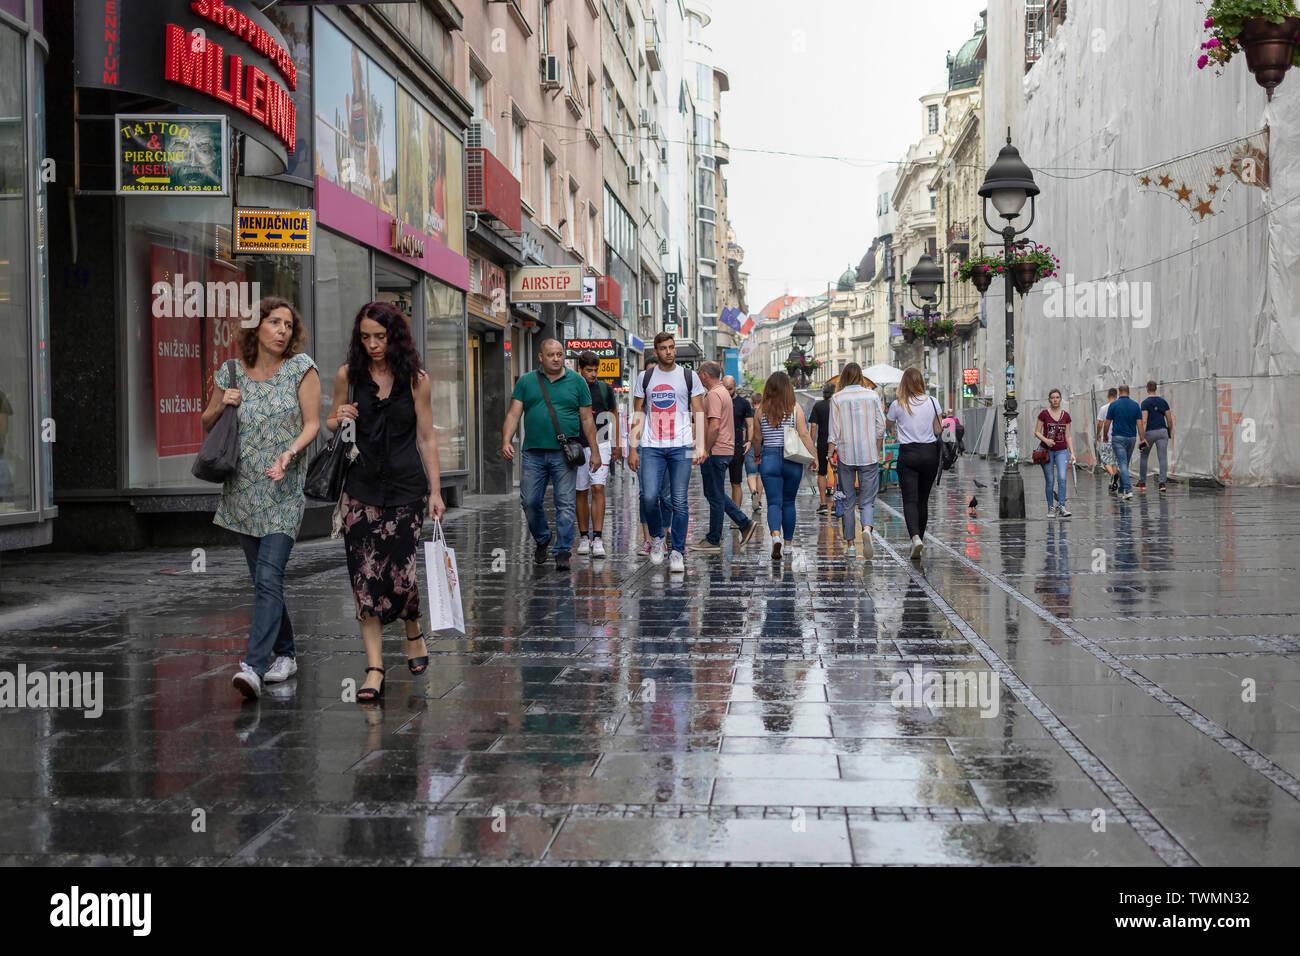 Belgrade, Serbia, June 18th 2019: Urban scene with people walking down the Knez Mihailova Street after spring rain - Stock Image